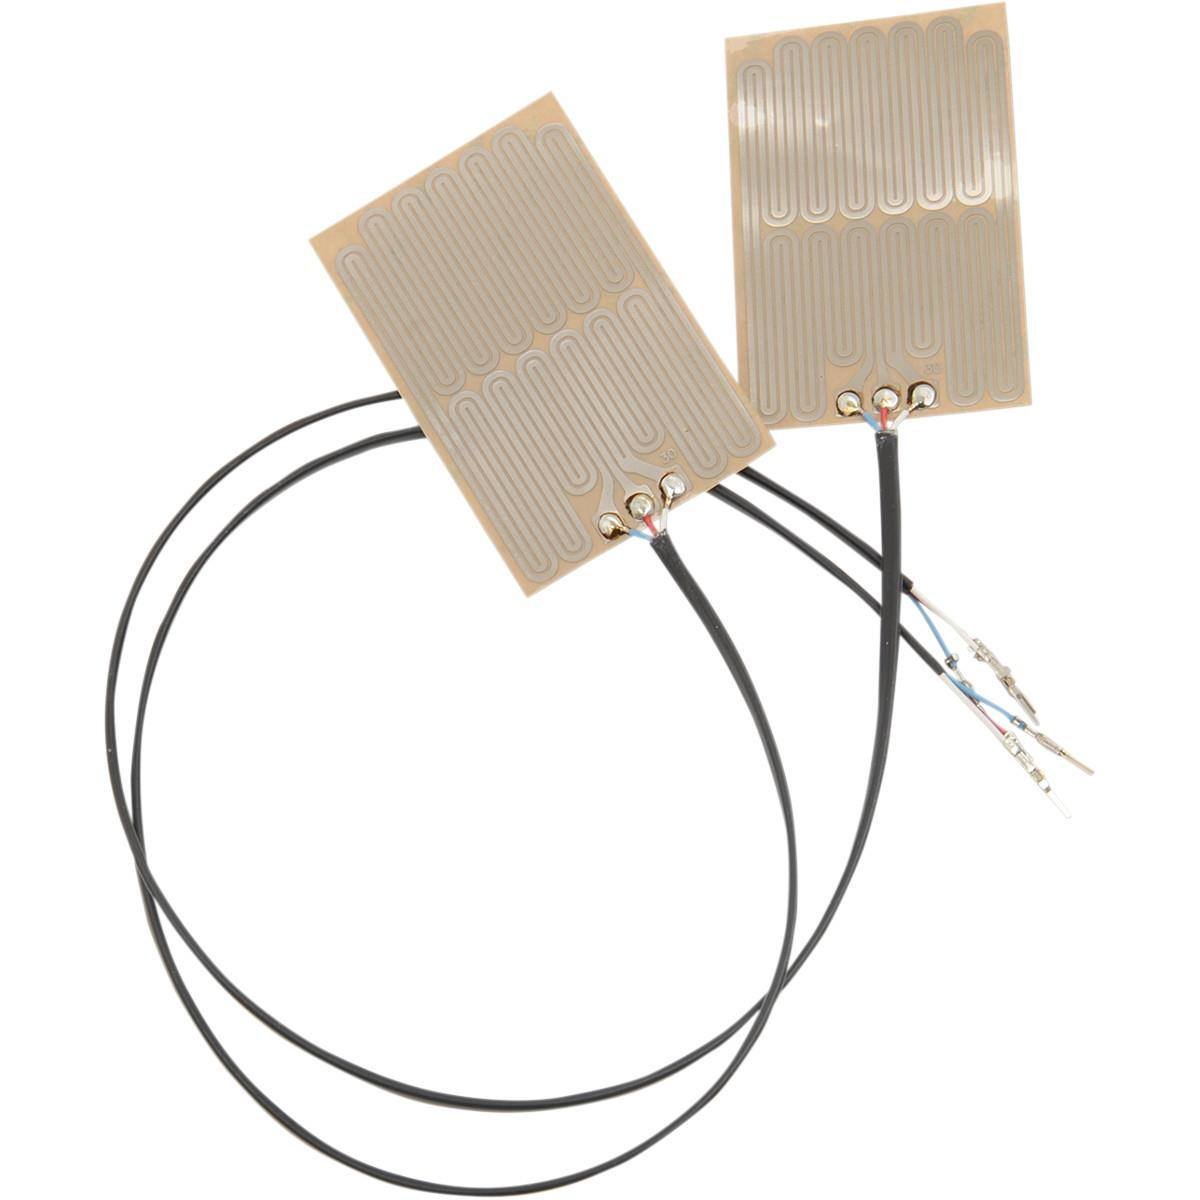 RSI Racing Extended Grip Heat Elmnt Kit w// OEM Terminals GH-12